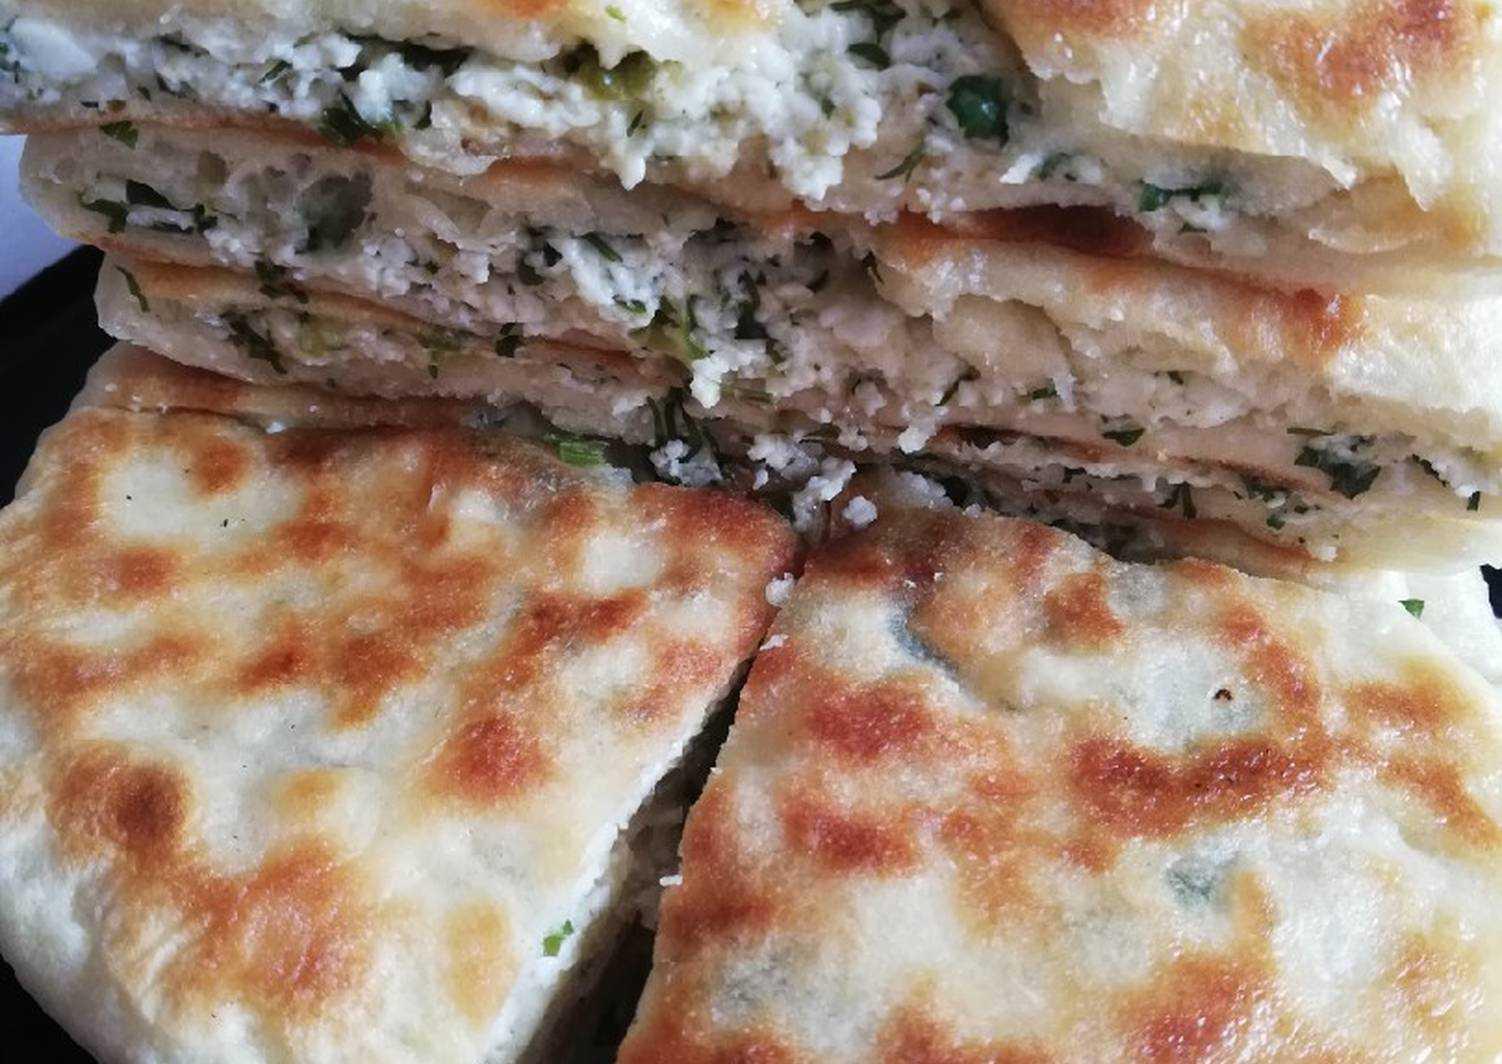 Армянские лепешки с зеленью: невероятно просто и вкусно!